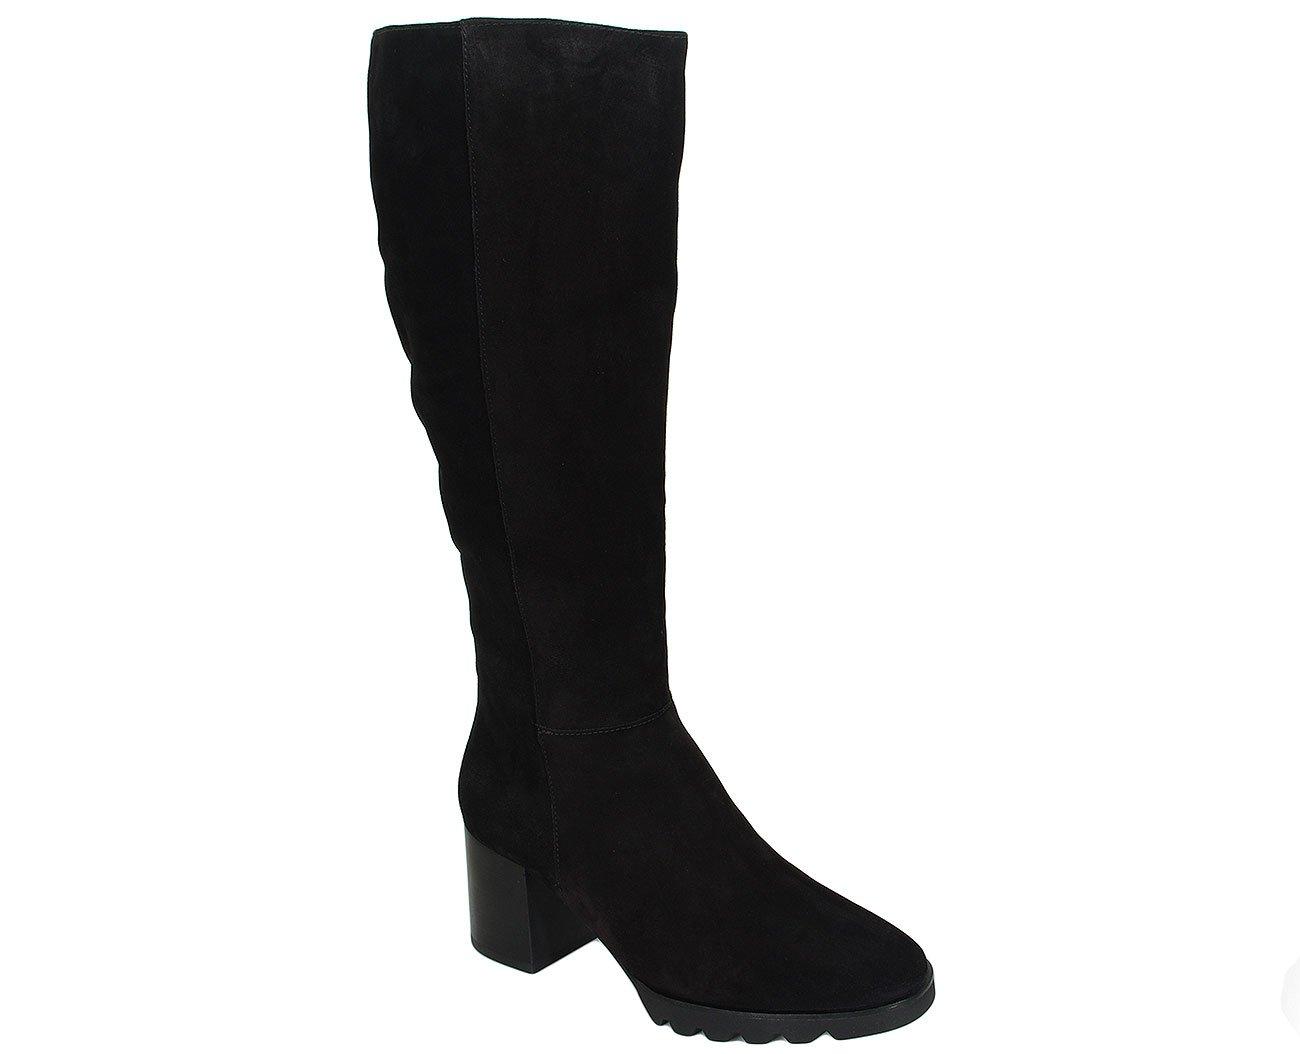 Hogl 4652 kozaki casualvelour black